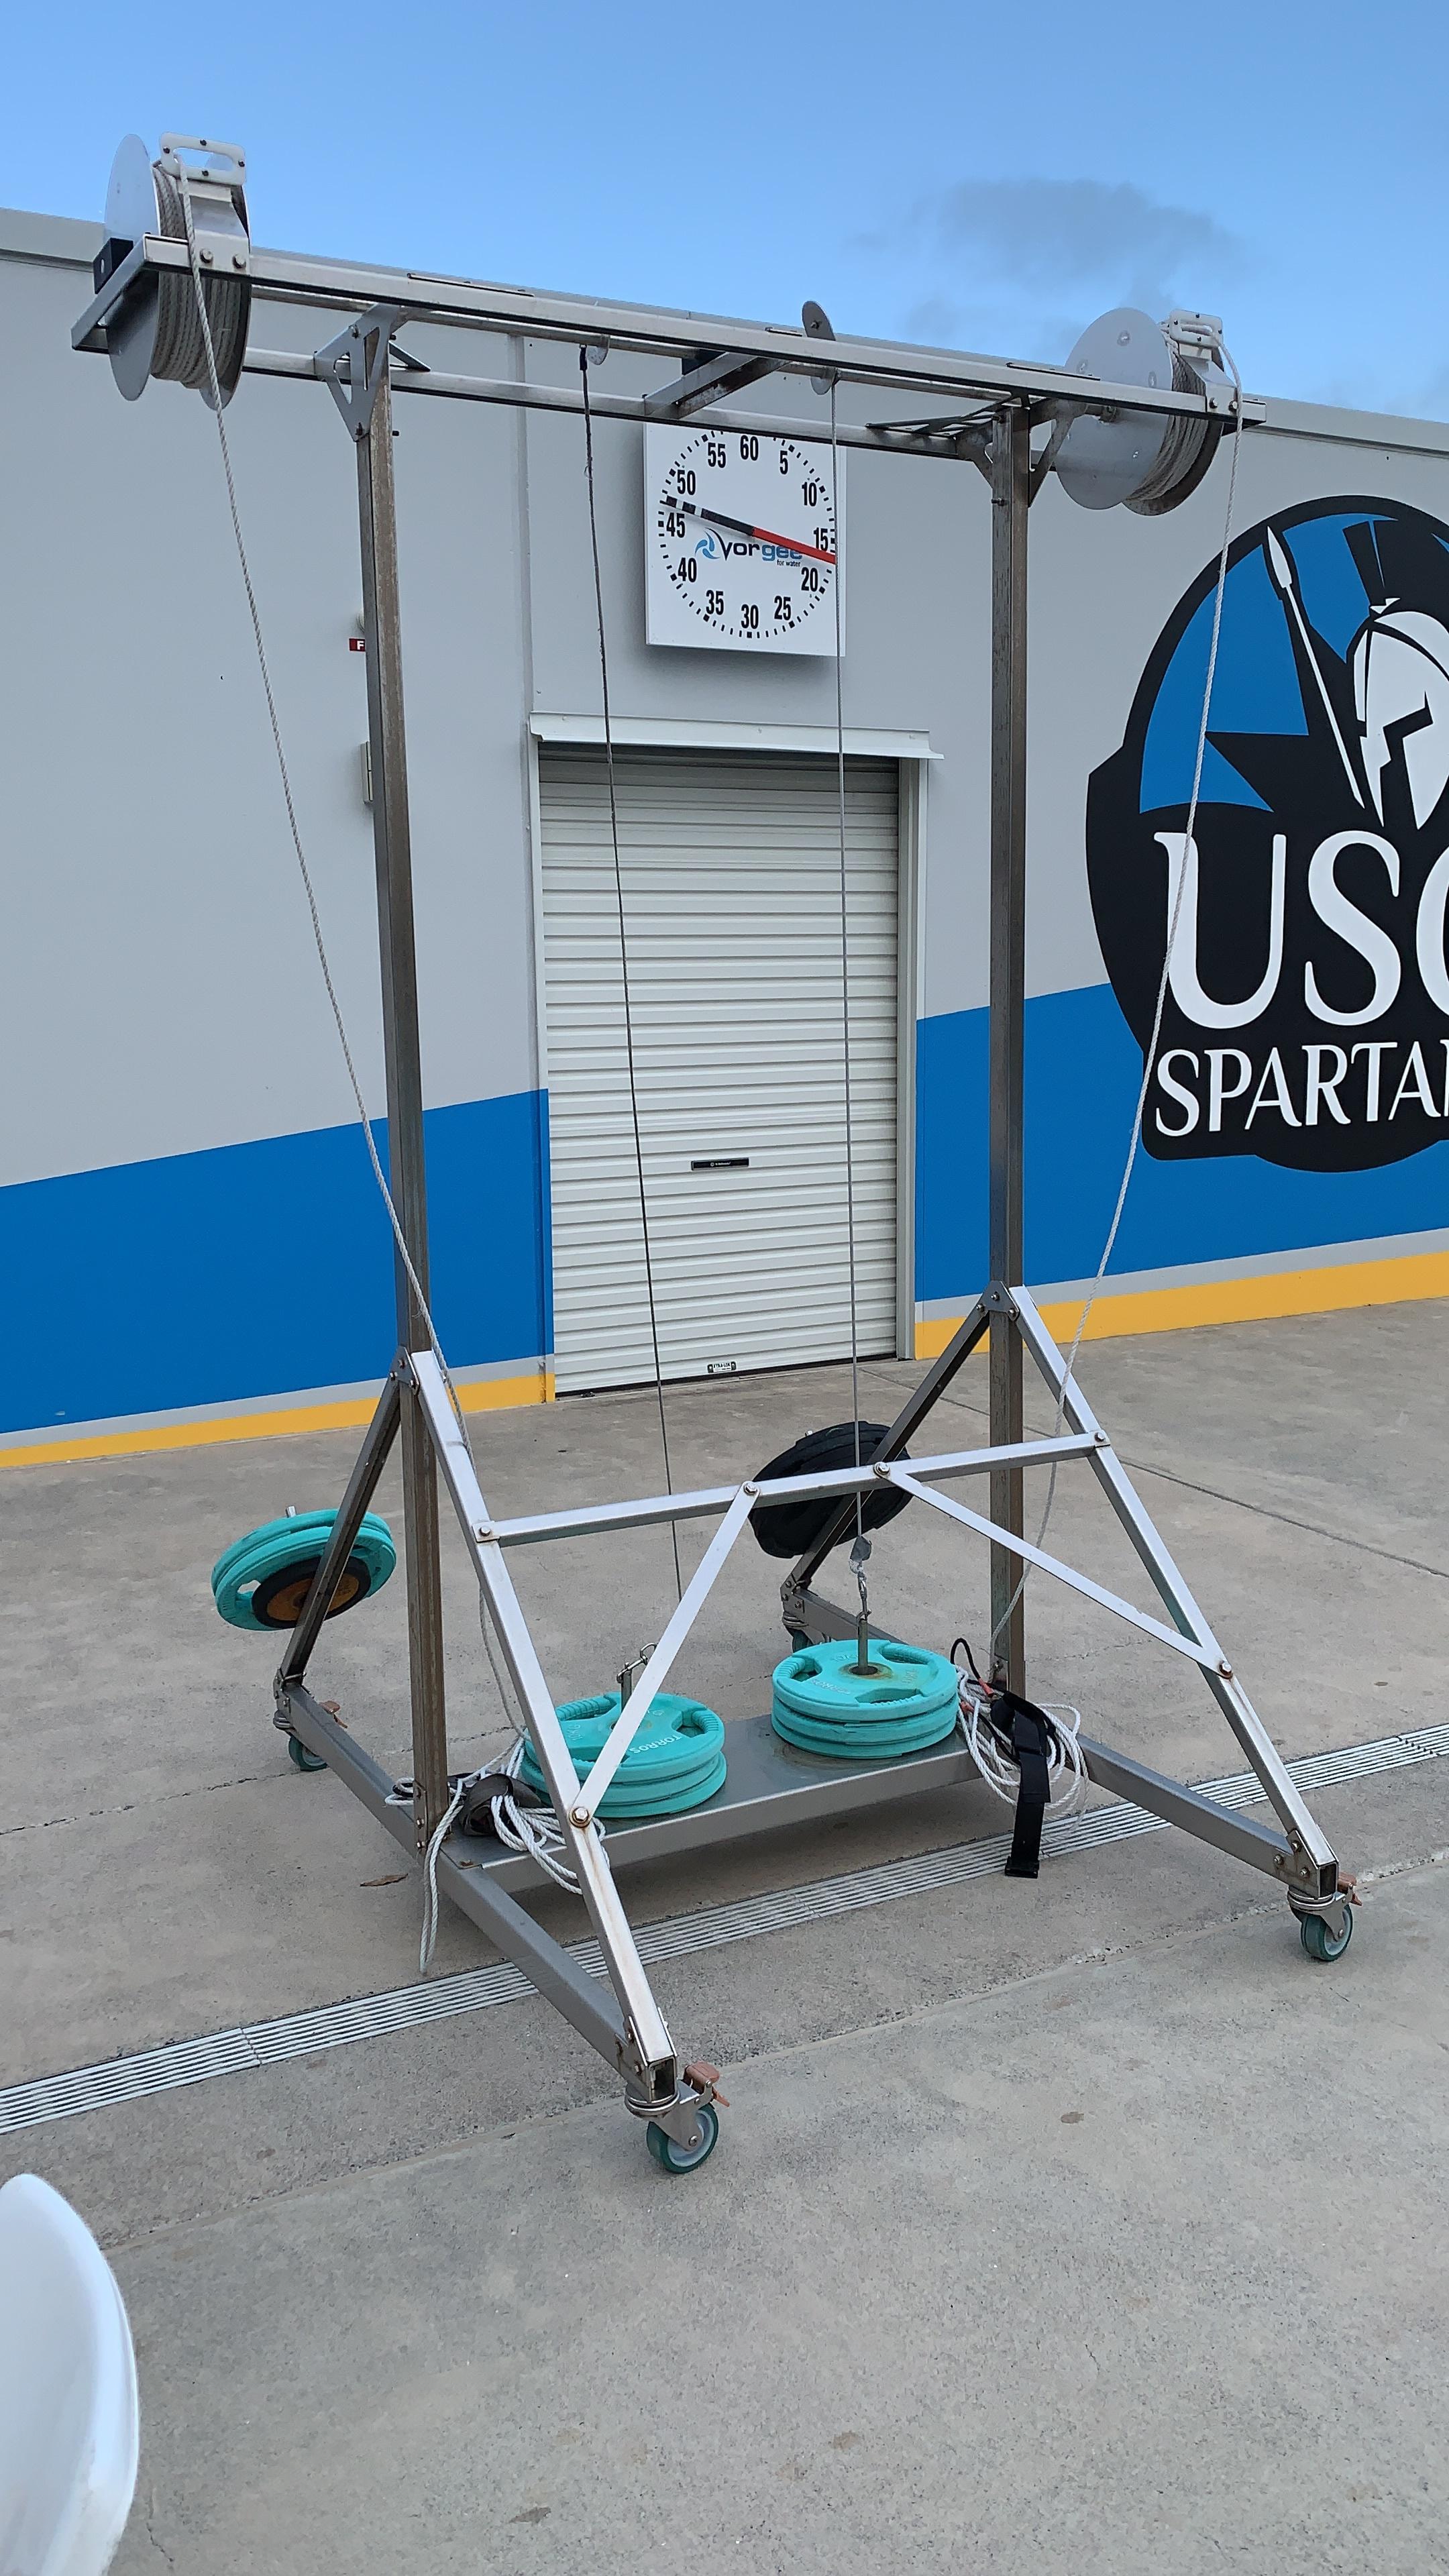 """power rack"" neboli jakasi kladka, kde na konci je pas. Obvykle mame 40 kg zateze a plaveme ruzne sprinty (max 20m)"